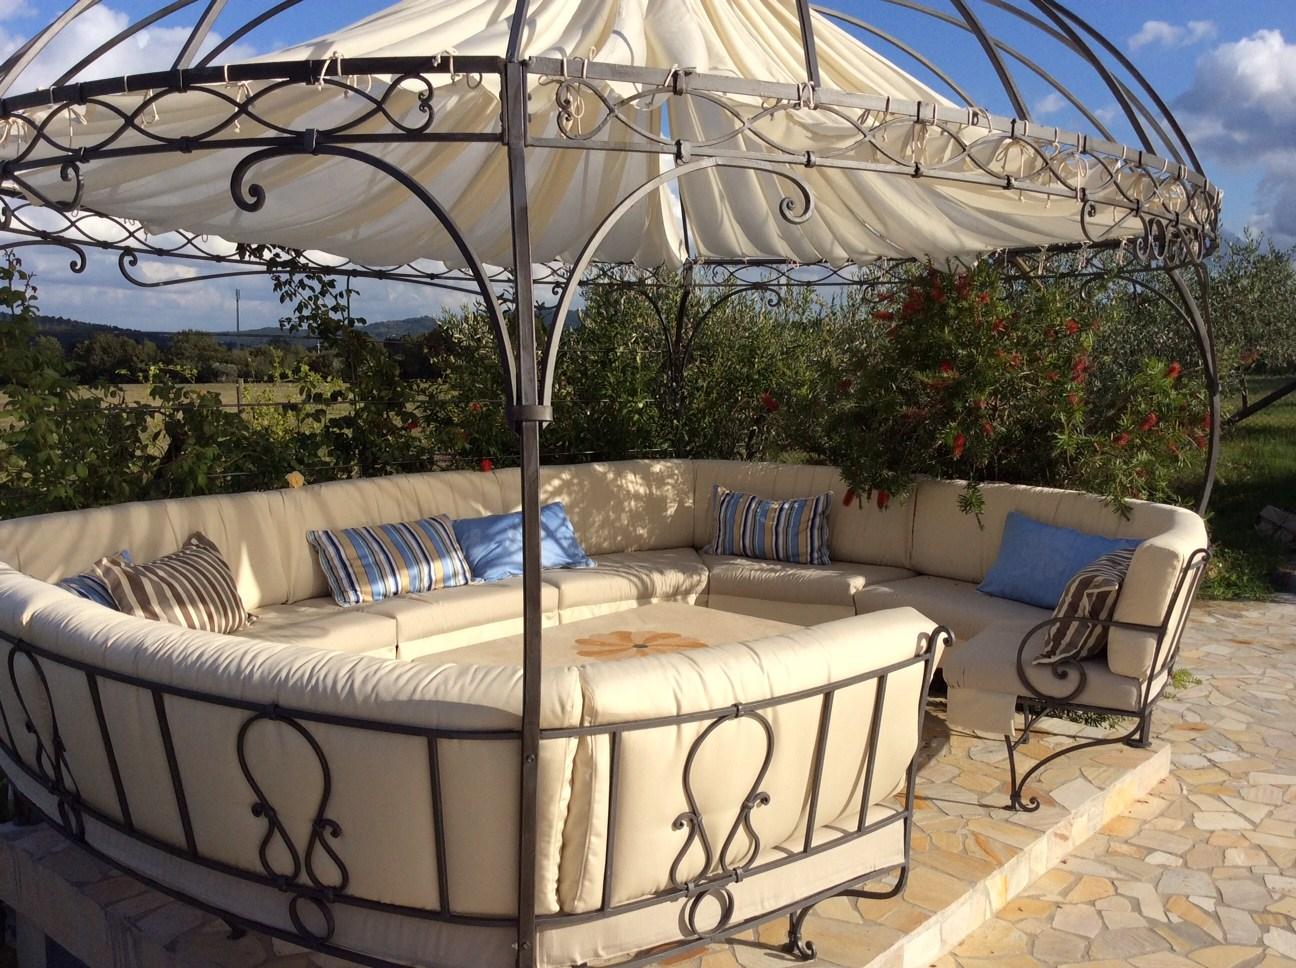 Gazebo in ferro battuto con panca Gazebo 6 Garden House Lazzerini